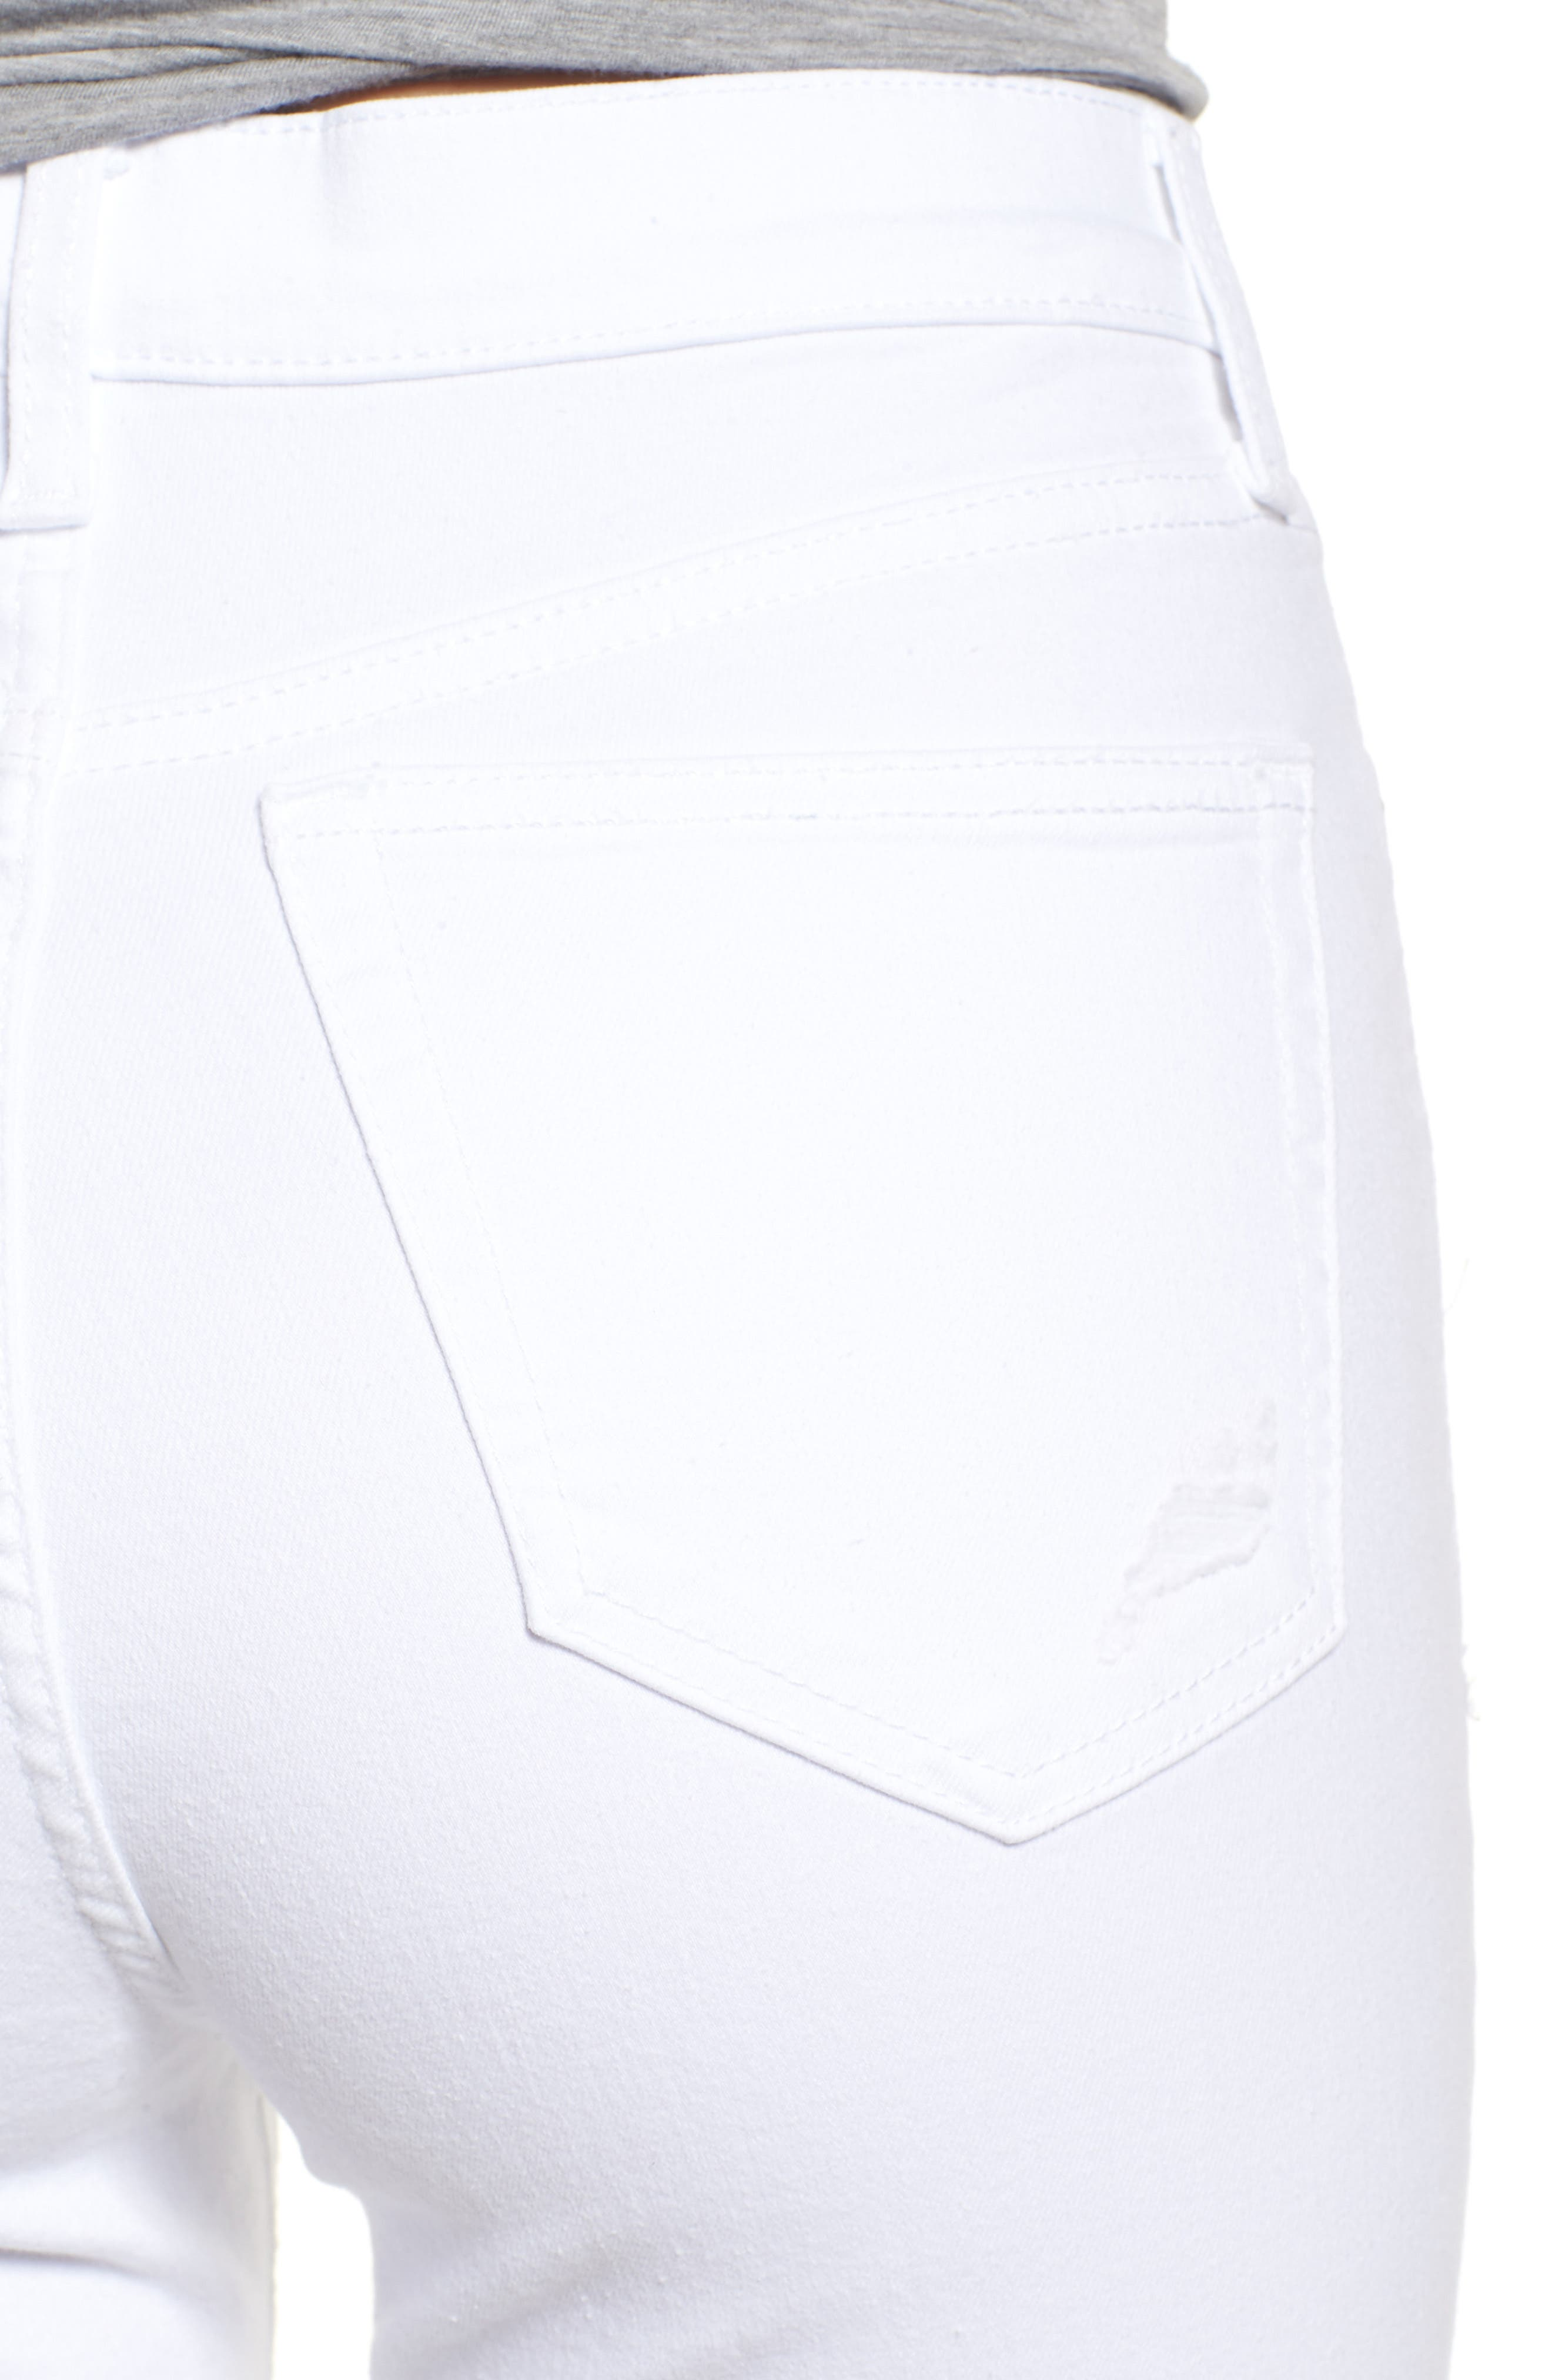 Jamie Super Rip Jeans,                             Alternate thumbnail 4, color,                             100